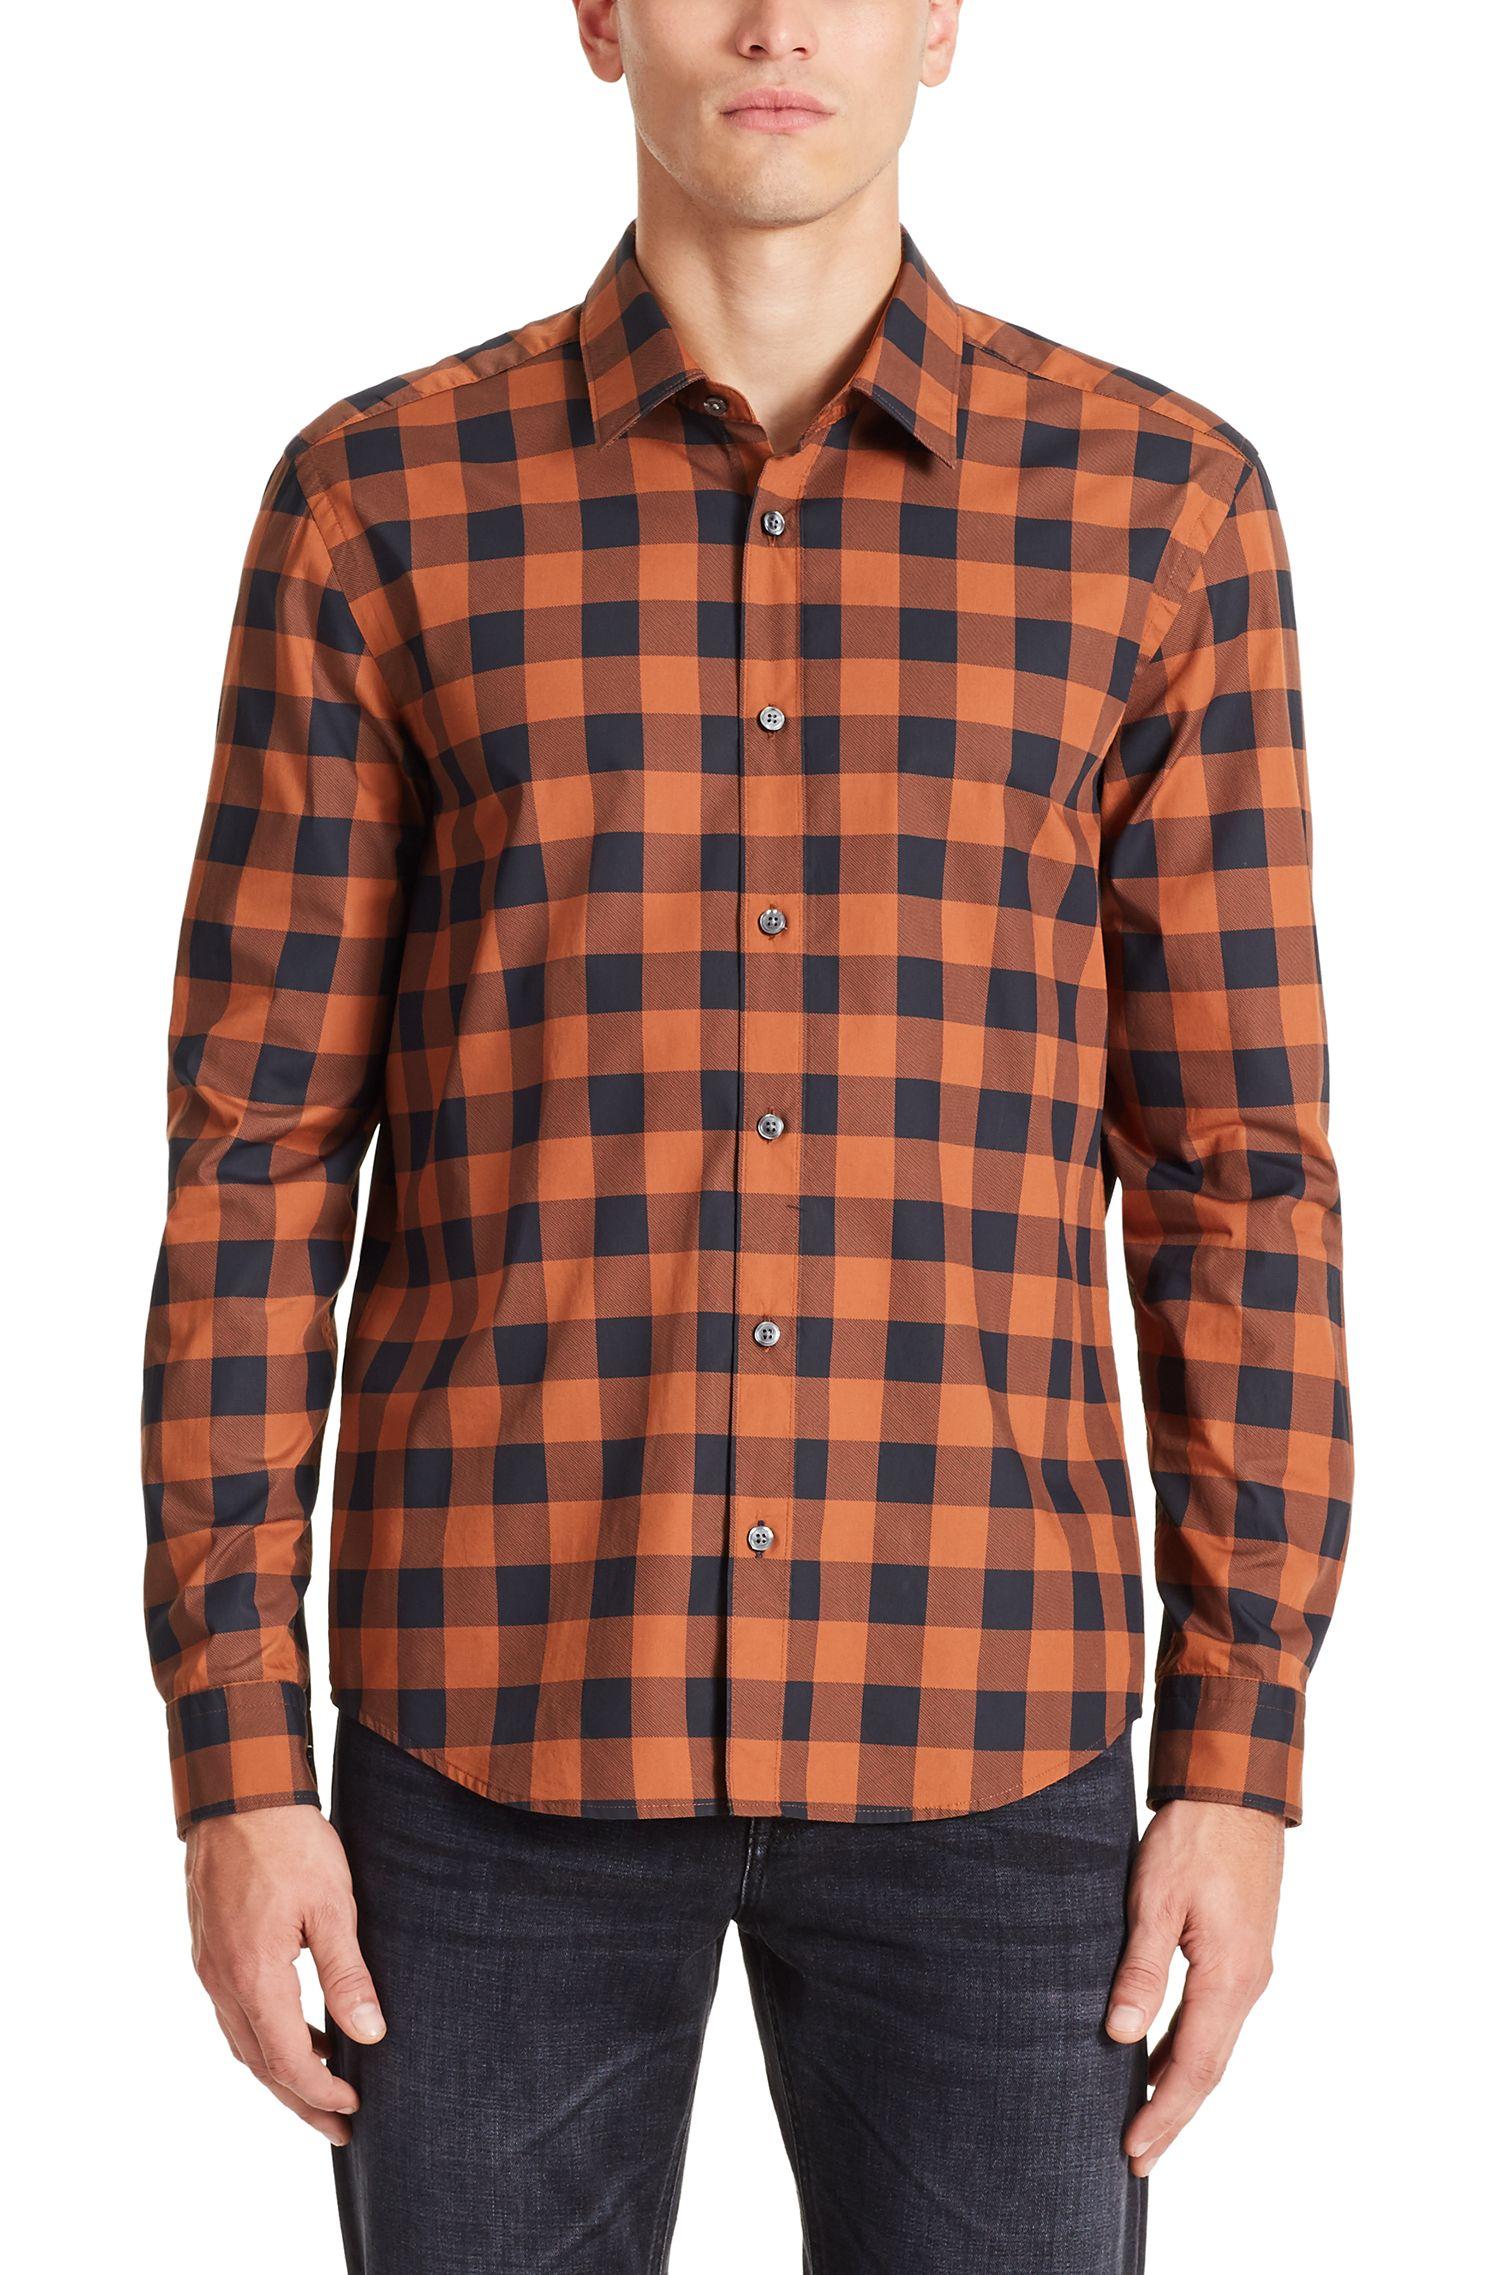 Buffalo Check Cotton Button Down Shirt, Regular Fit | Lance